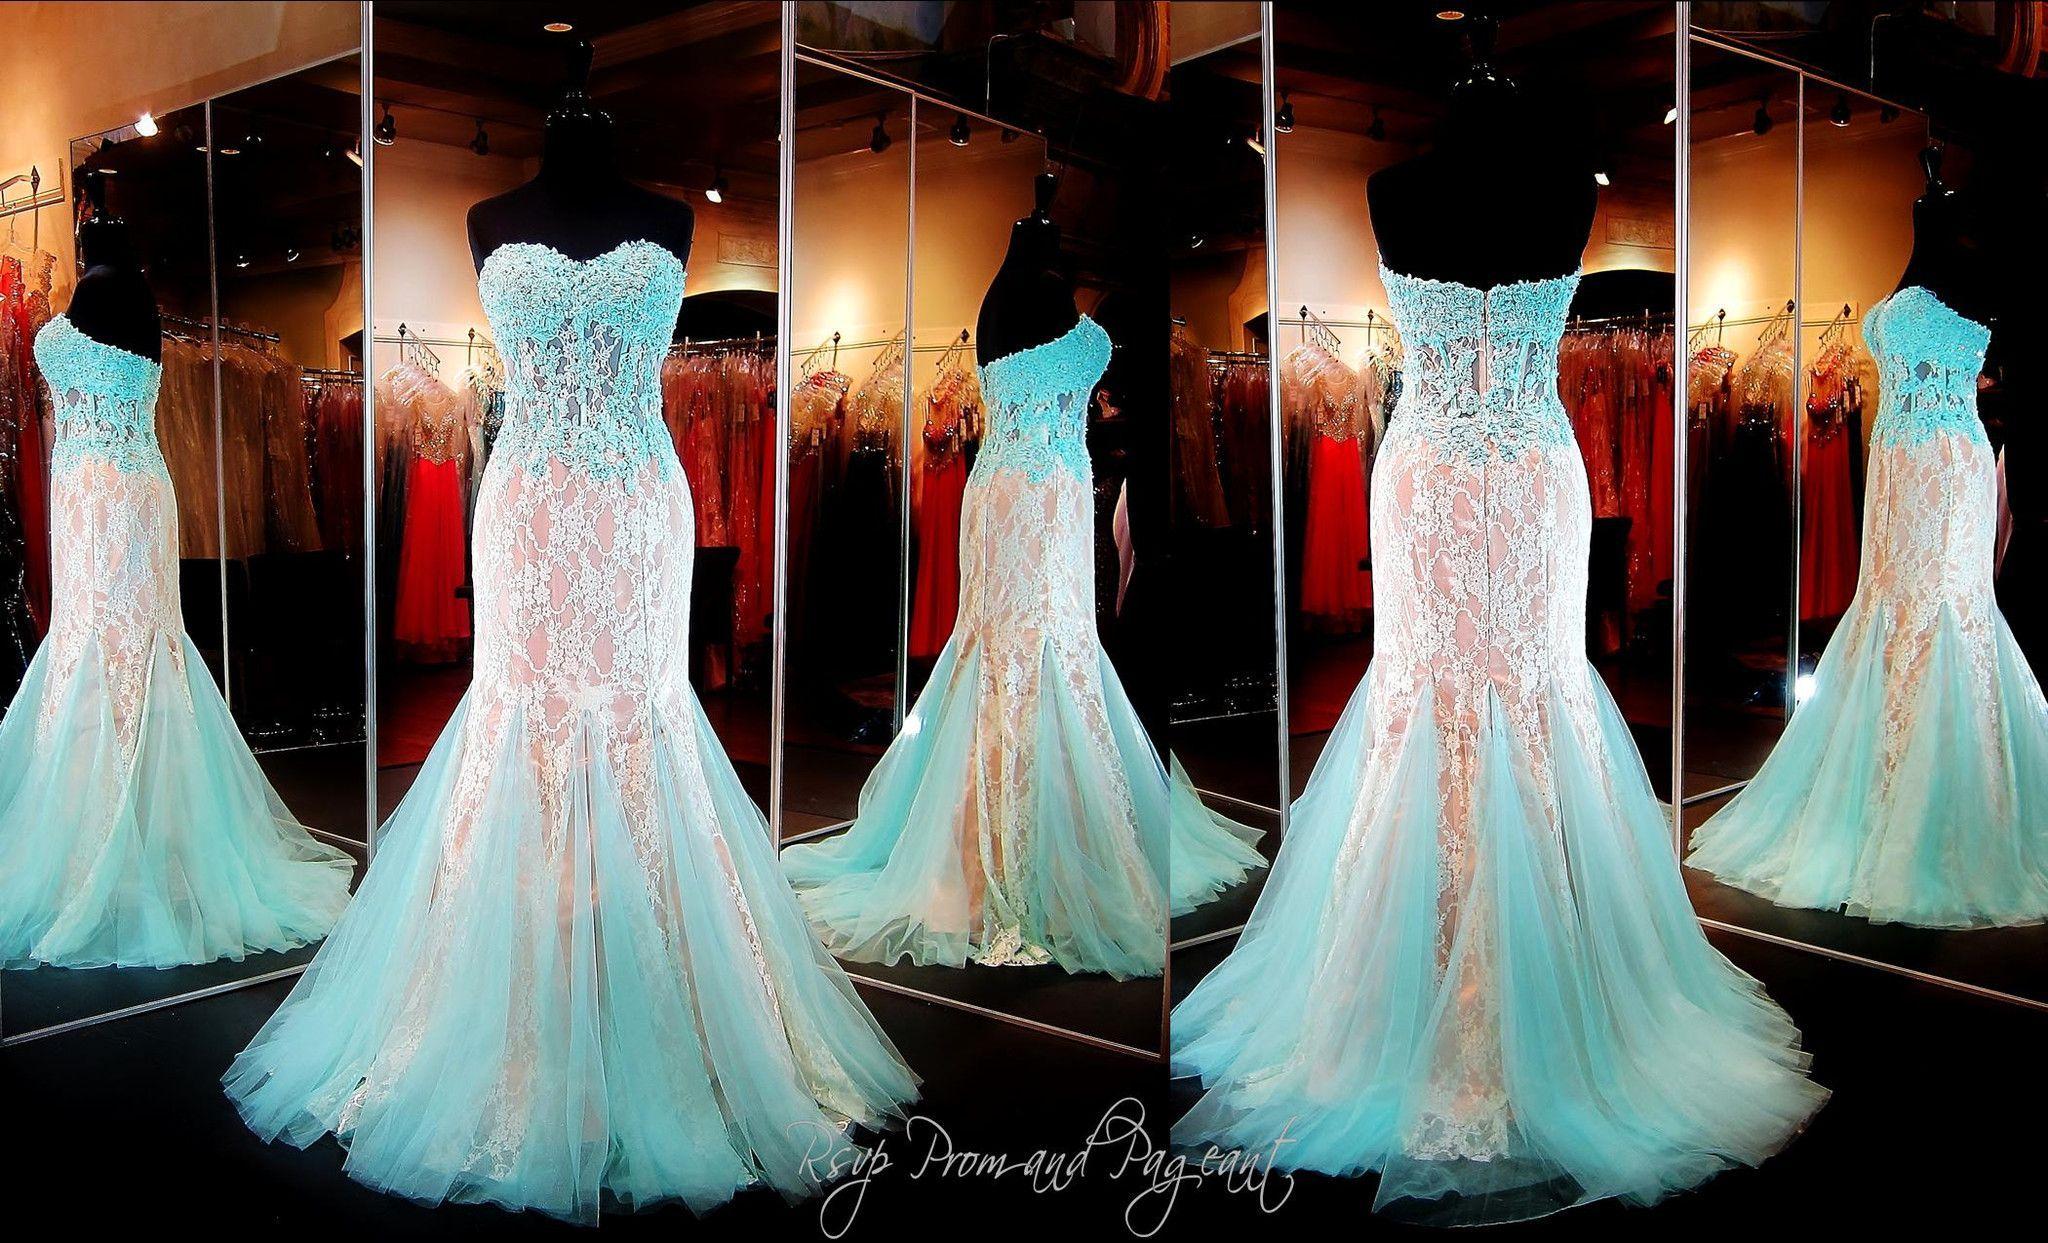 aqua-nude-lace-prom-dress-mermaid-sheer-midrift-115dj011600395 at ...